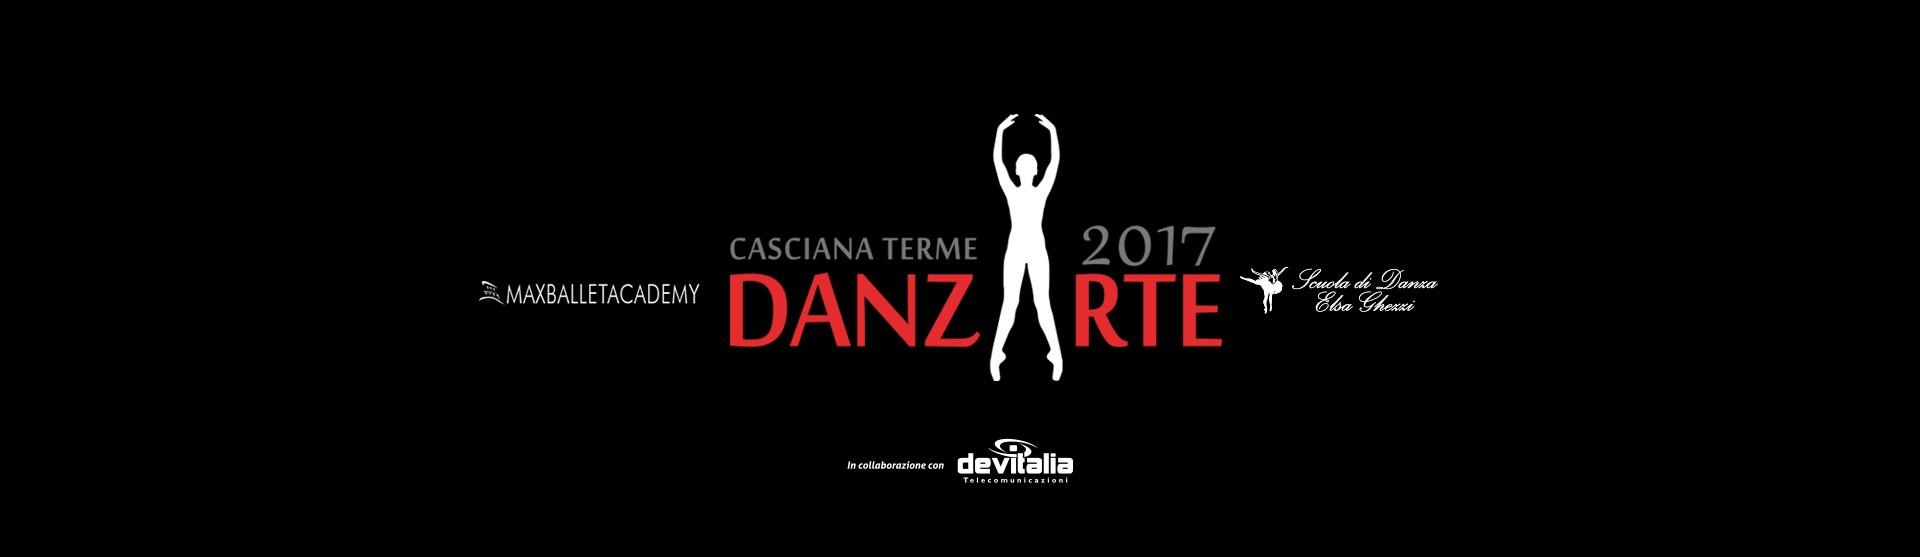 DanzArte Casciana Terme 2017